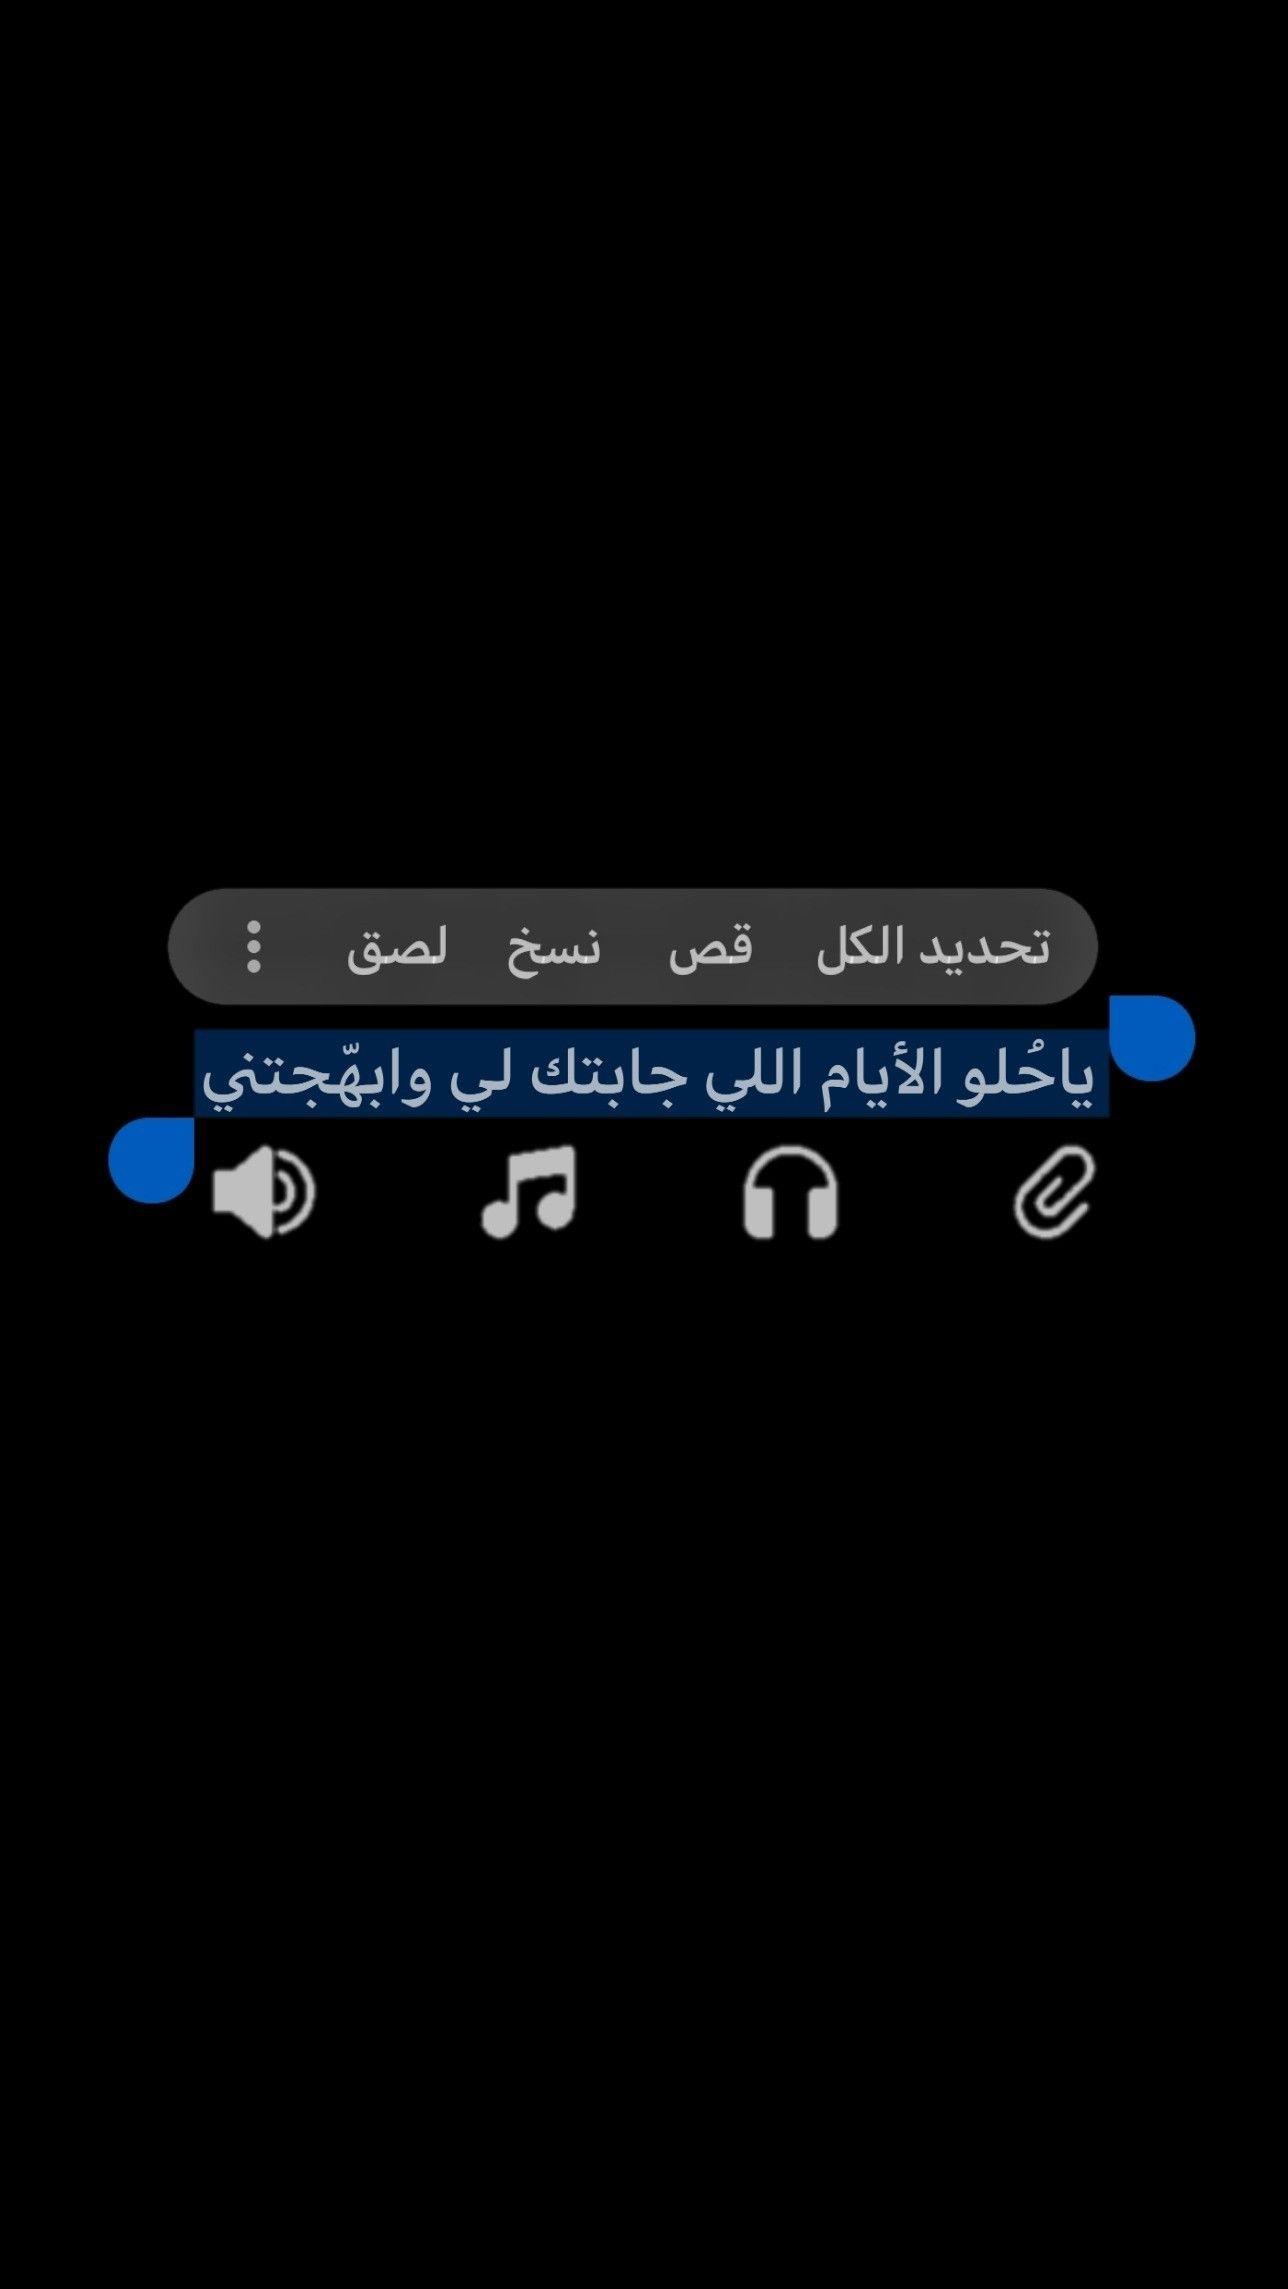 اقتباسات كتاباتي عشق سعادة خواطر تمبلر تليجرام Funny Arabic Quotes Arabic Love Quotes Book Aesthetic